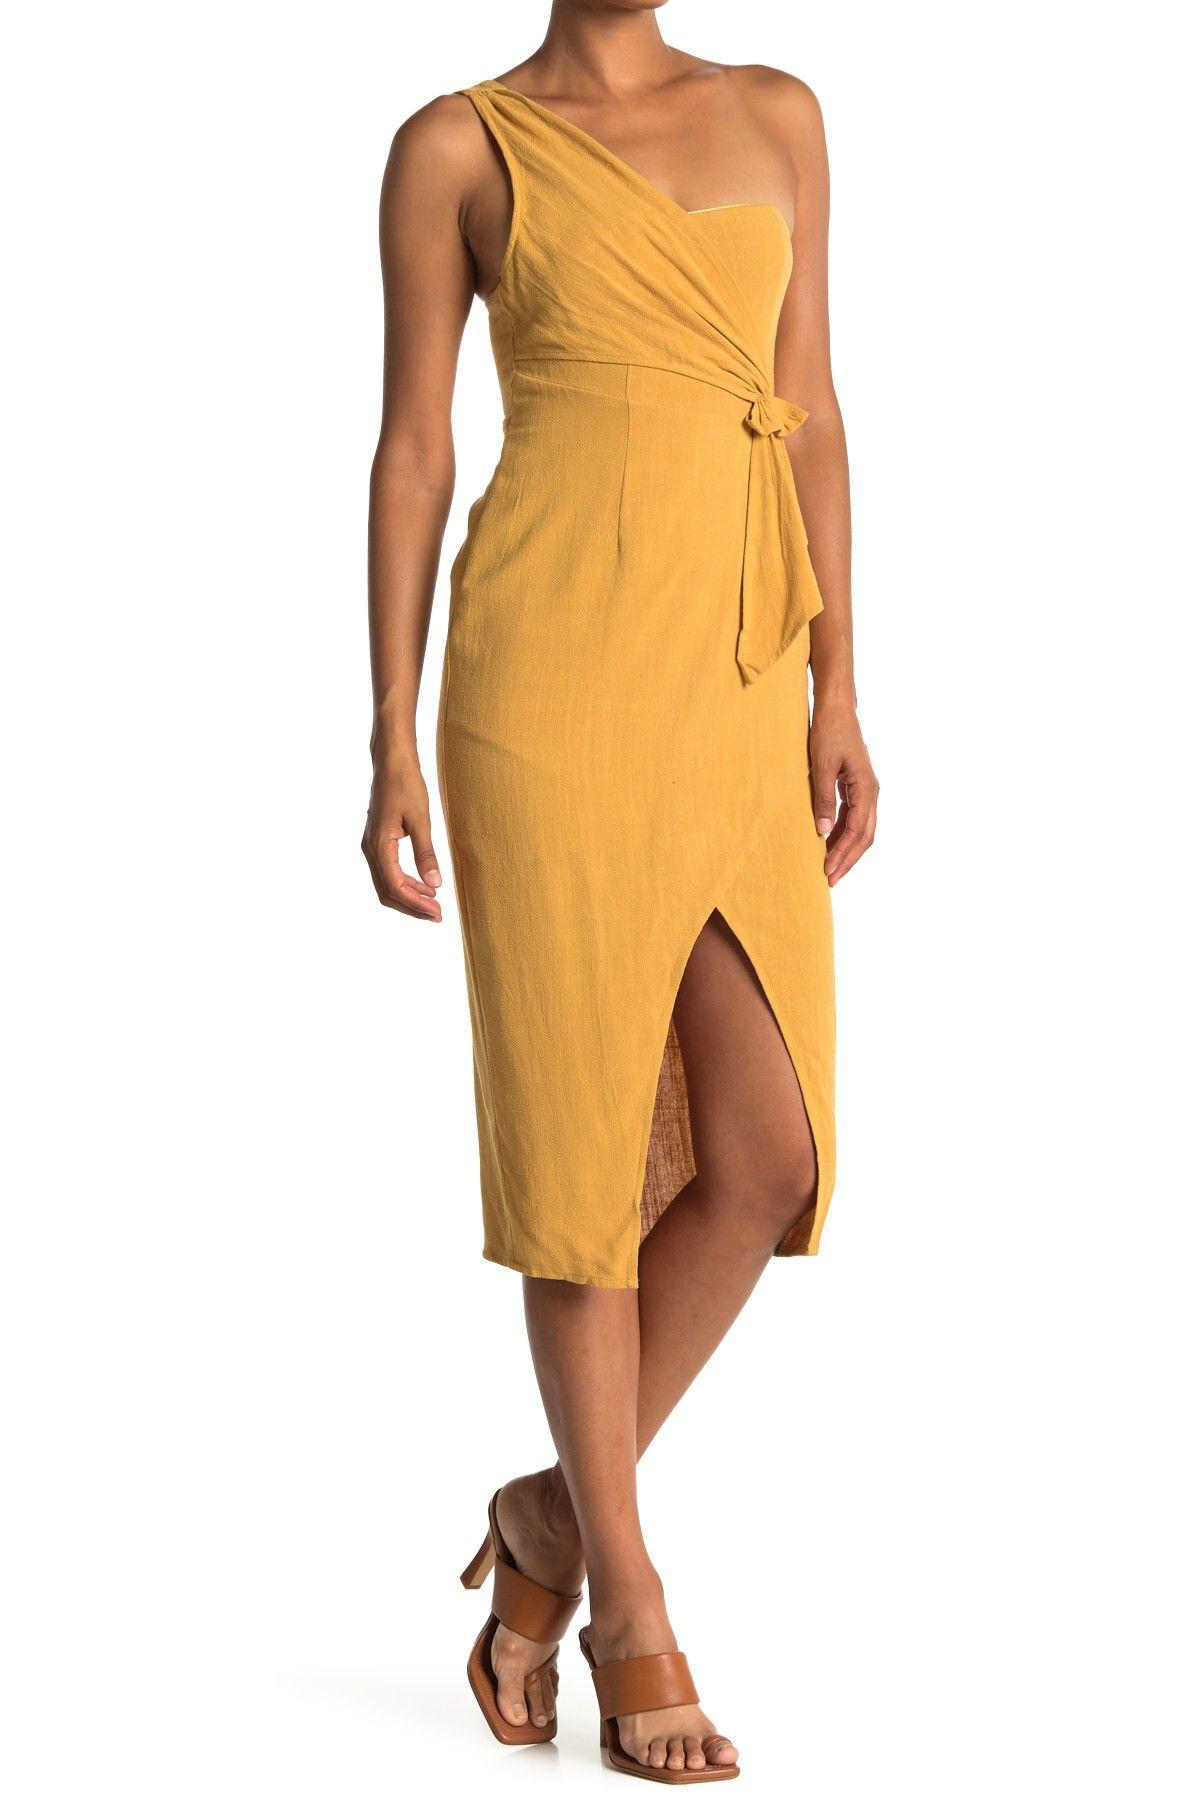 Favlux One Shoulder Faux Wrap Dress Nordstrom Rack Dresses Nordstrom Dresses Wrap Dress [ 1800 x 1200 Pixel ]